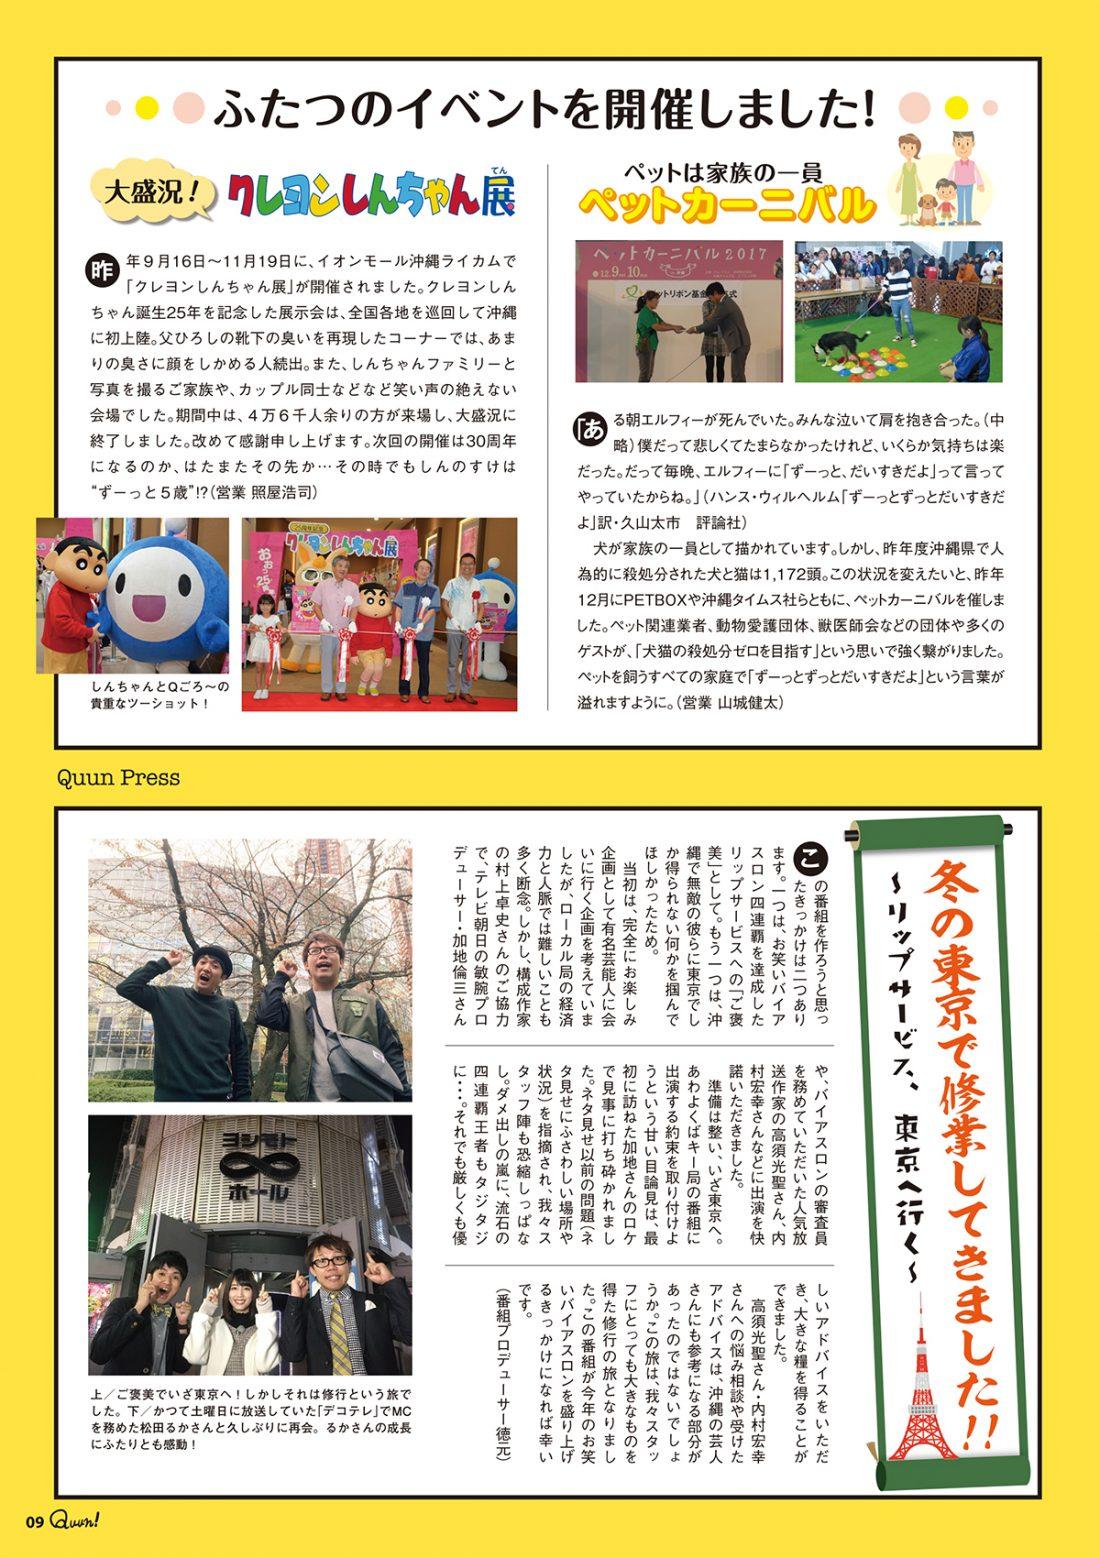 http://www.qab.co.jp/qgoro/wp-content/uploads/quun_0911-1100x1558.jpg